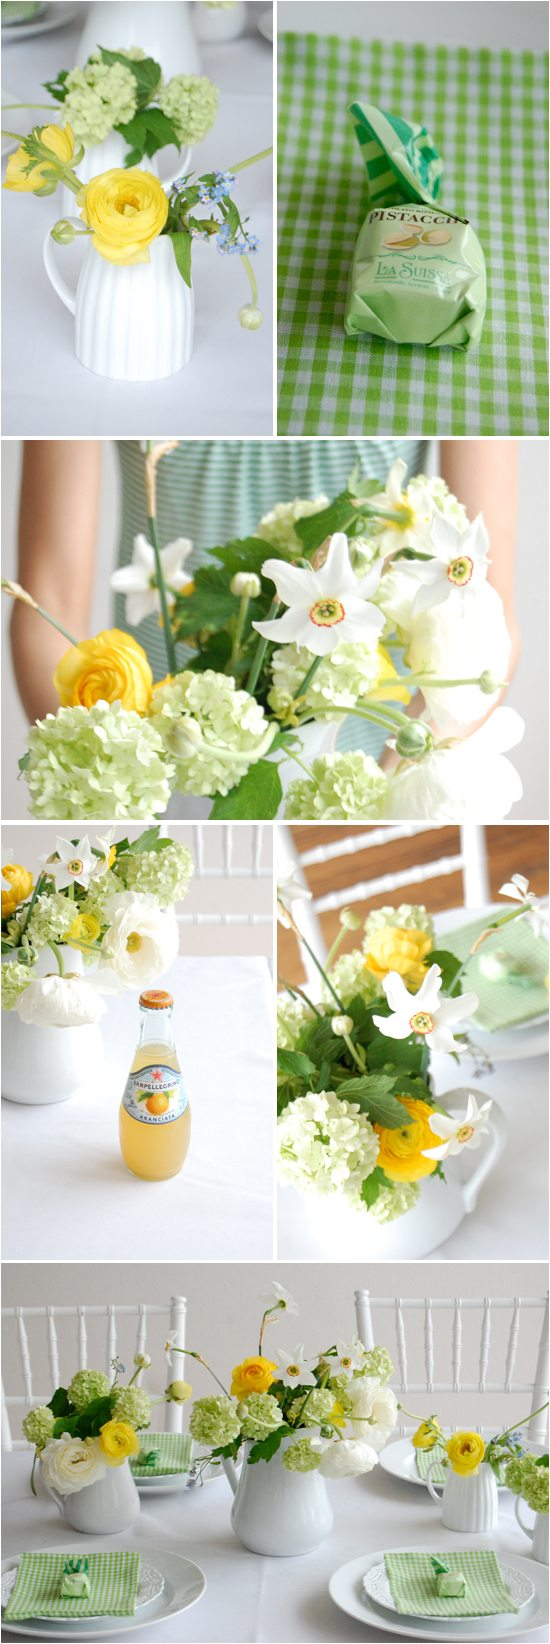 green-white-summer-wedding-gingham-napkins-pistachio-wedding-favor-ideas